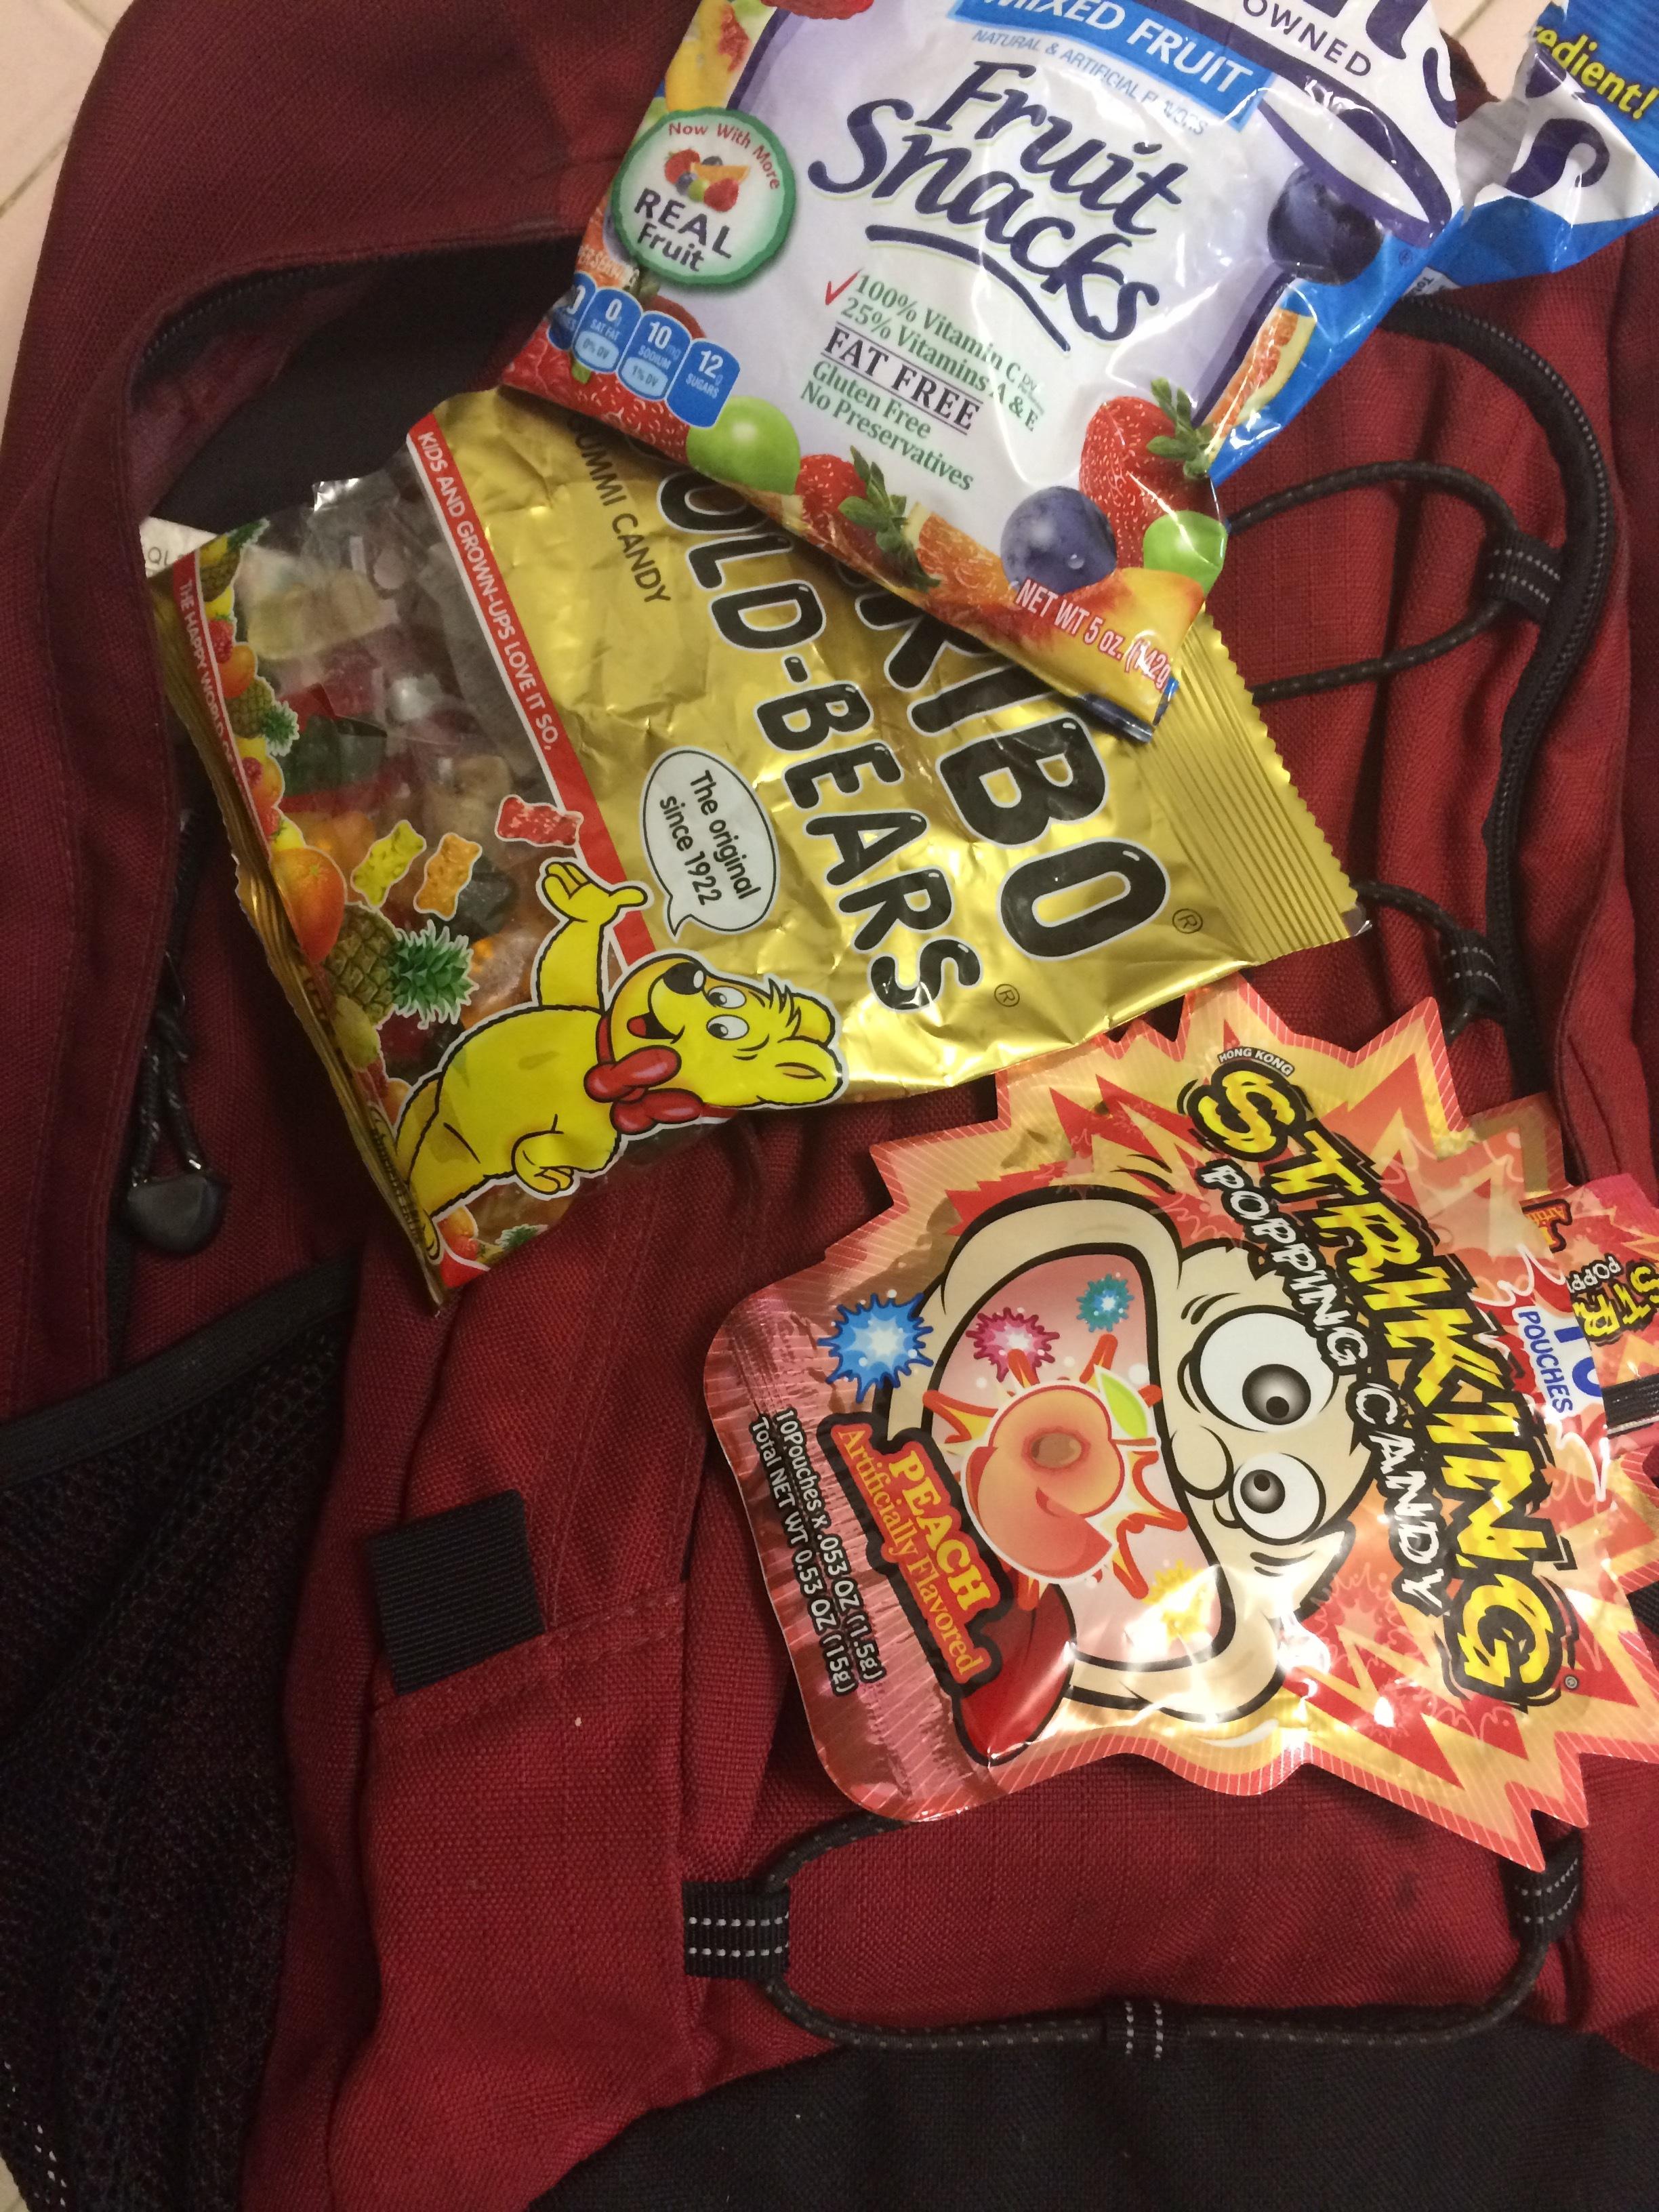 I had plenty of treats in my backpack, just no real food ...